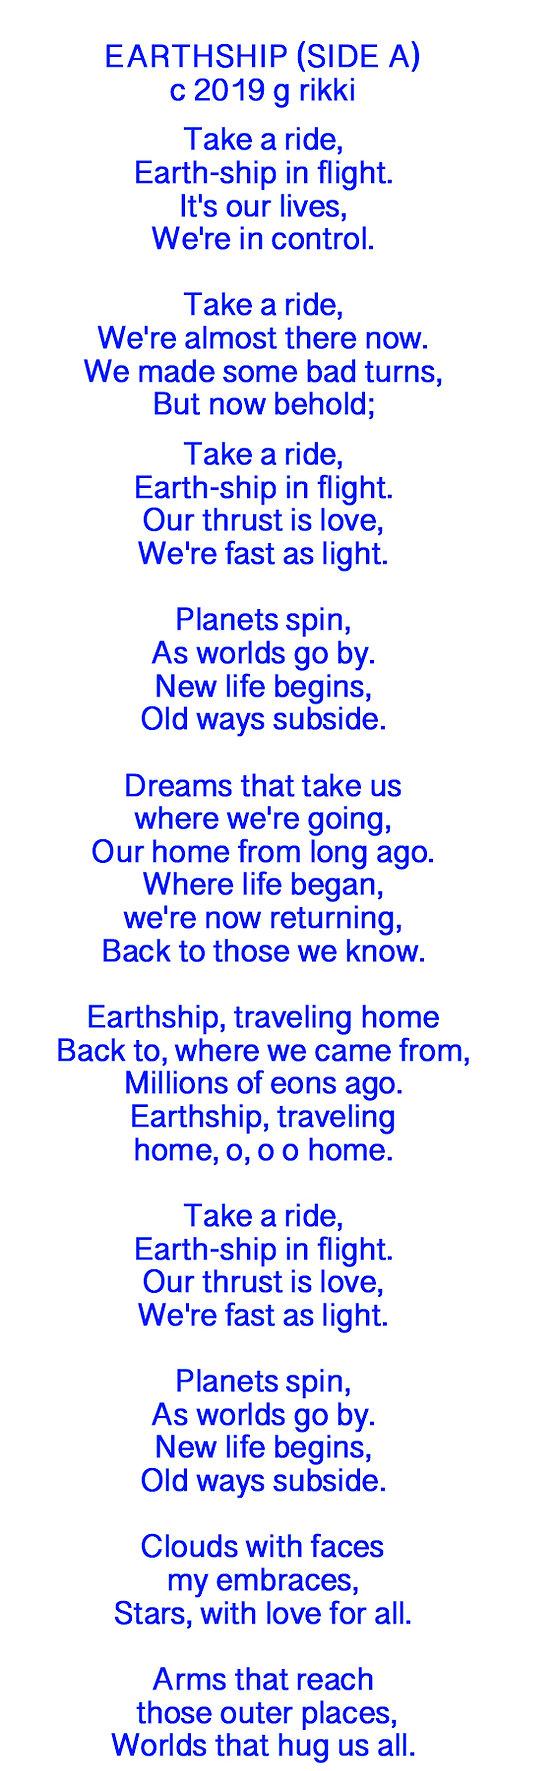 Earthship.jpg